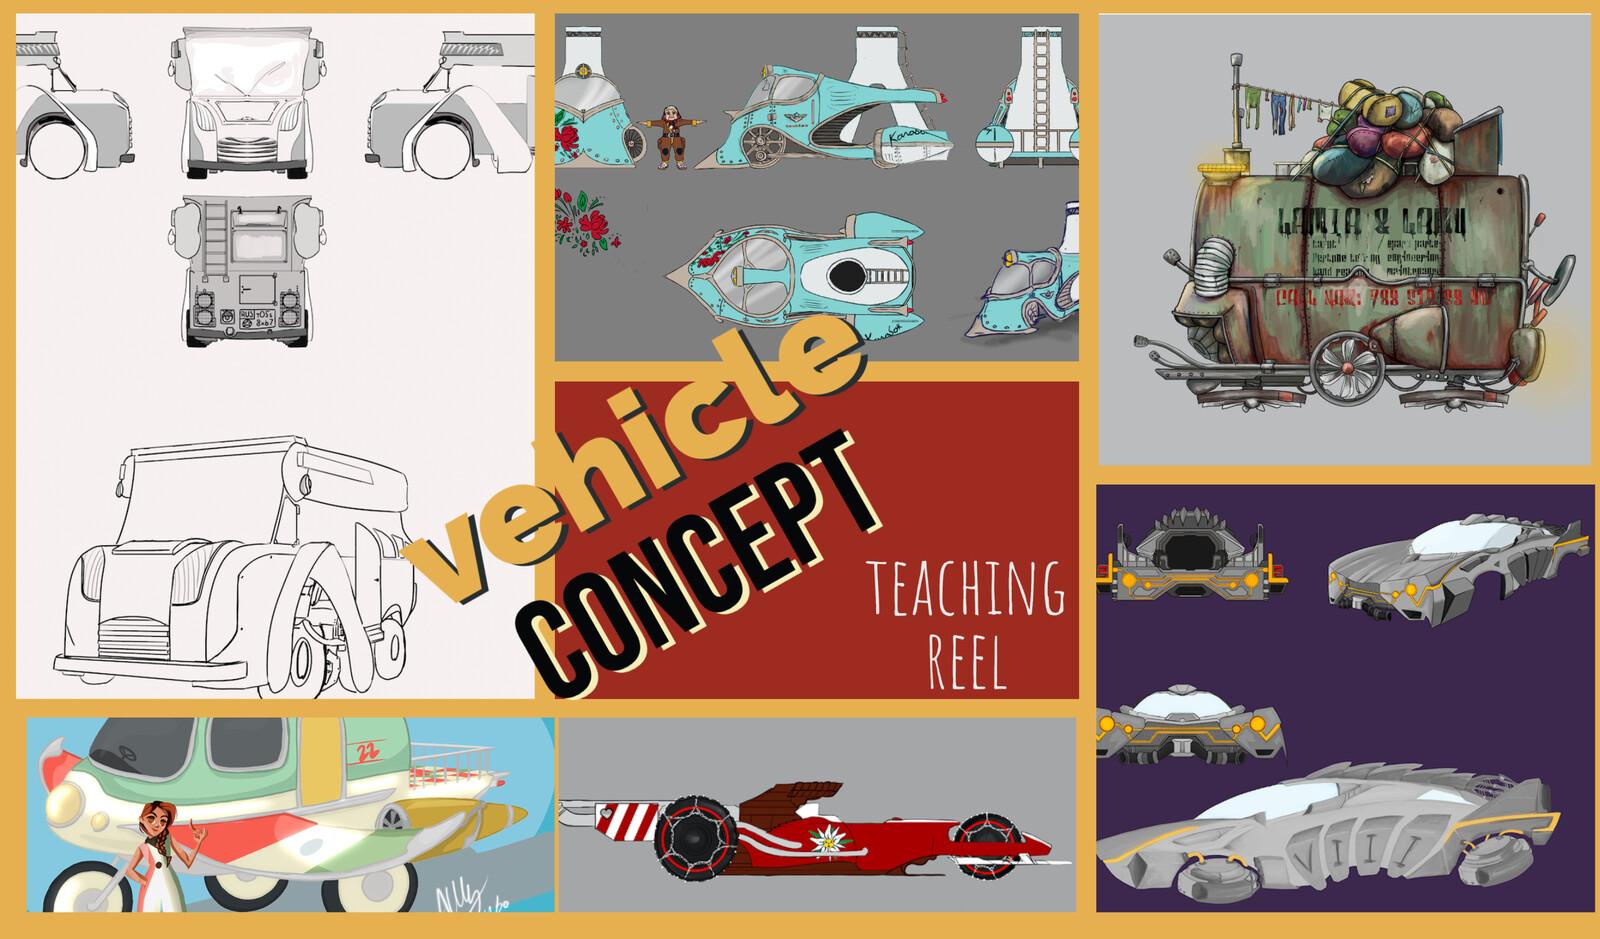 Vehicle Concept, Teaching Reel with Uppsala University, Sweden